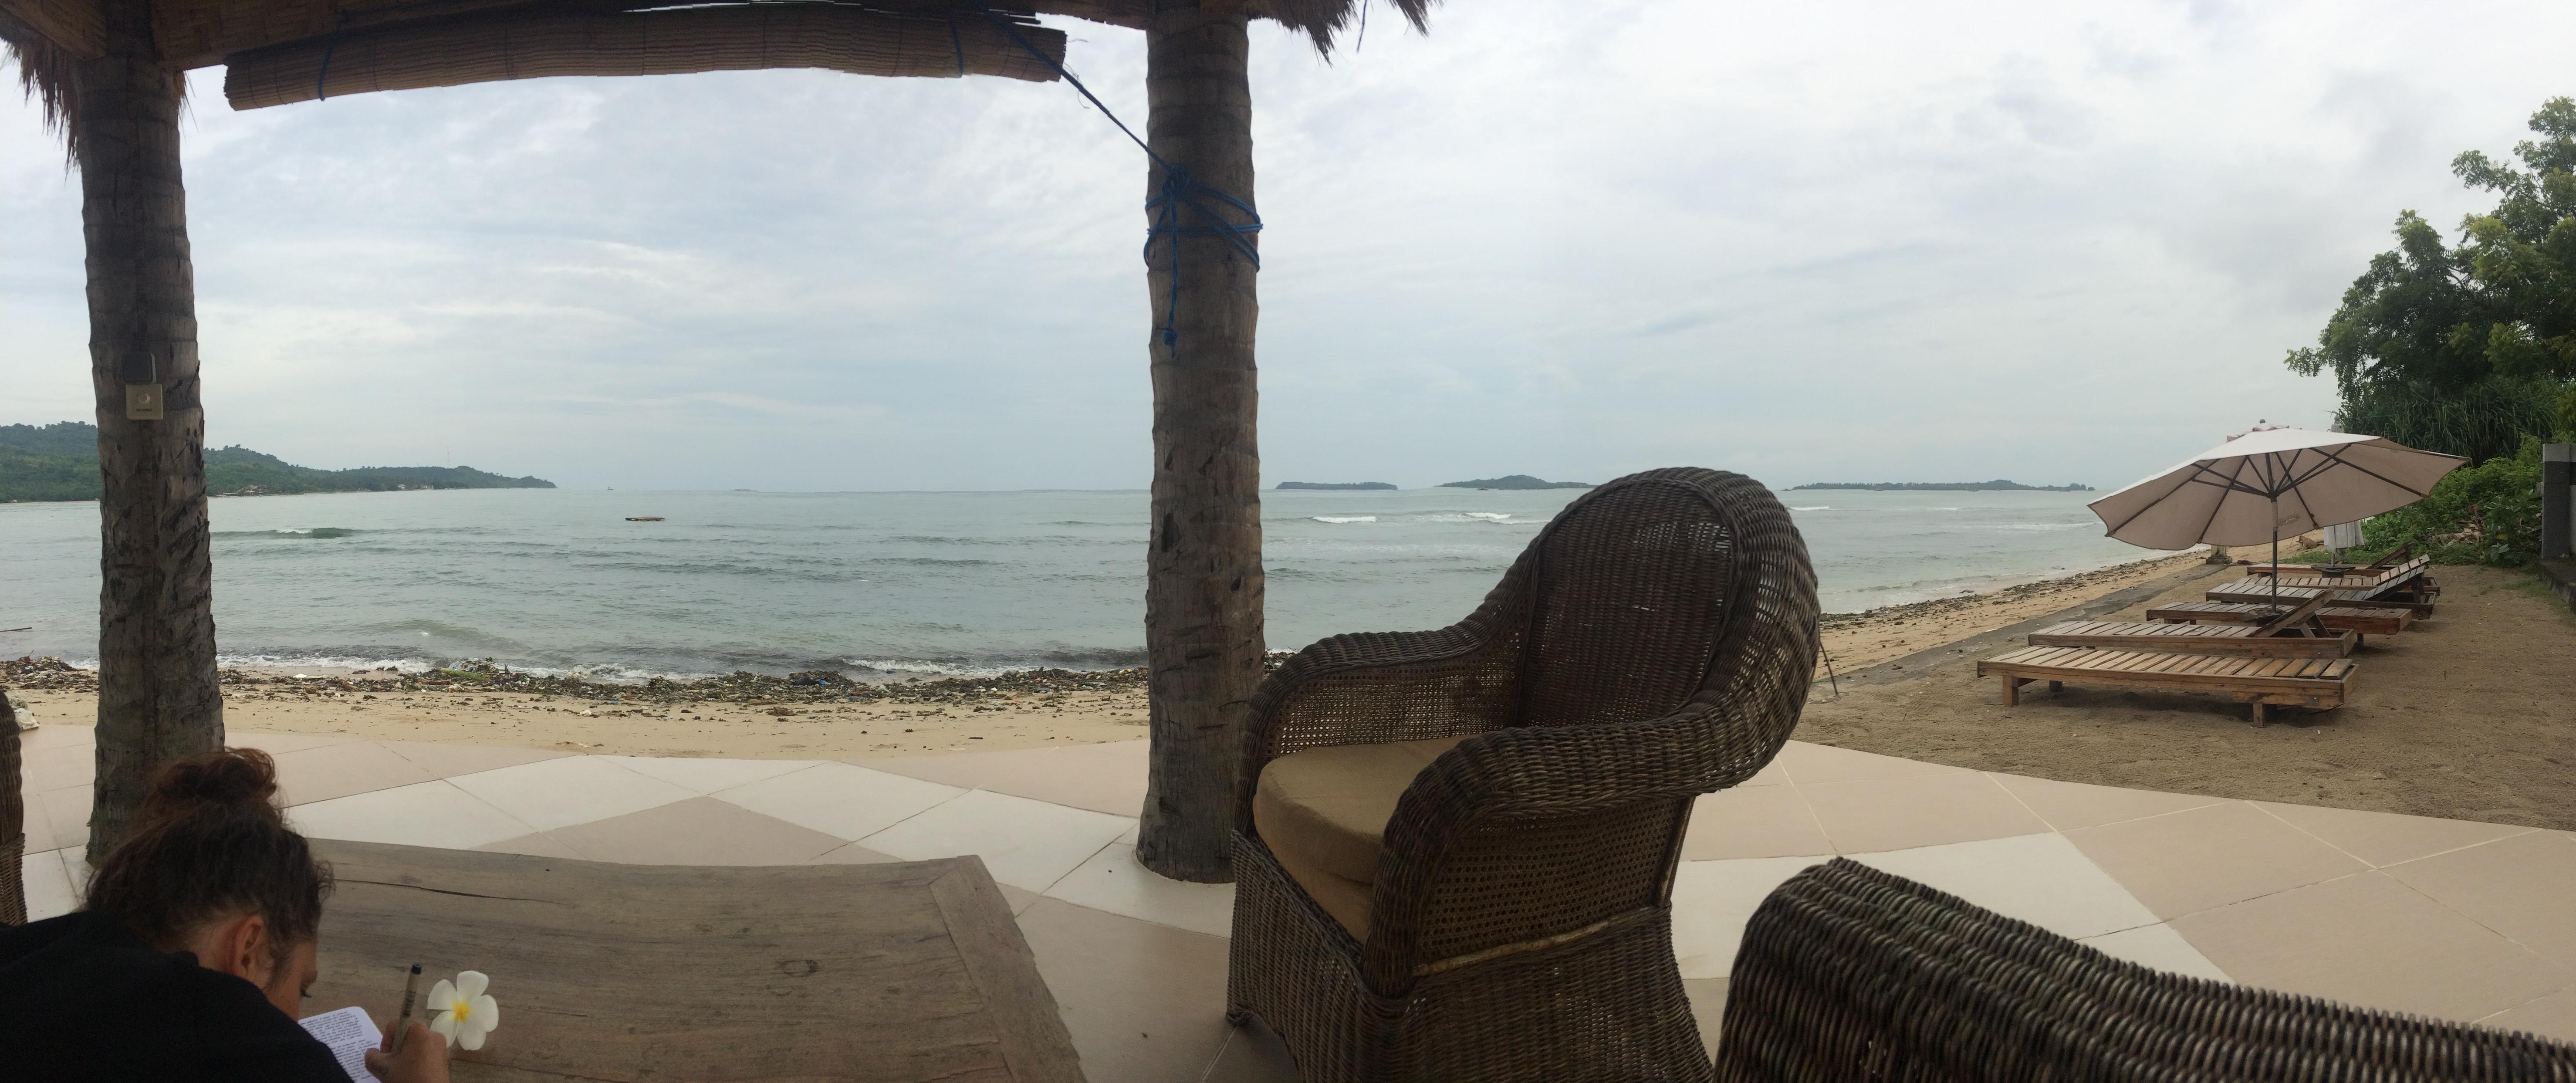 Plage hôtel Coral Palm, Lombok, Indonésie.